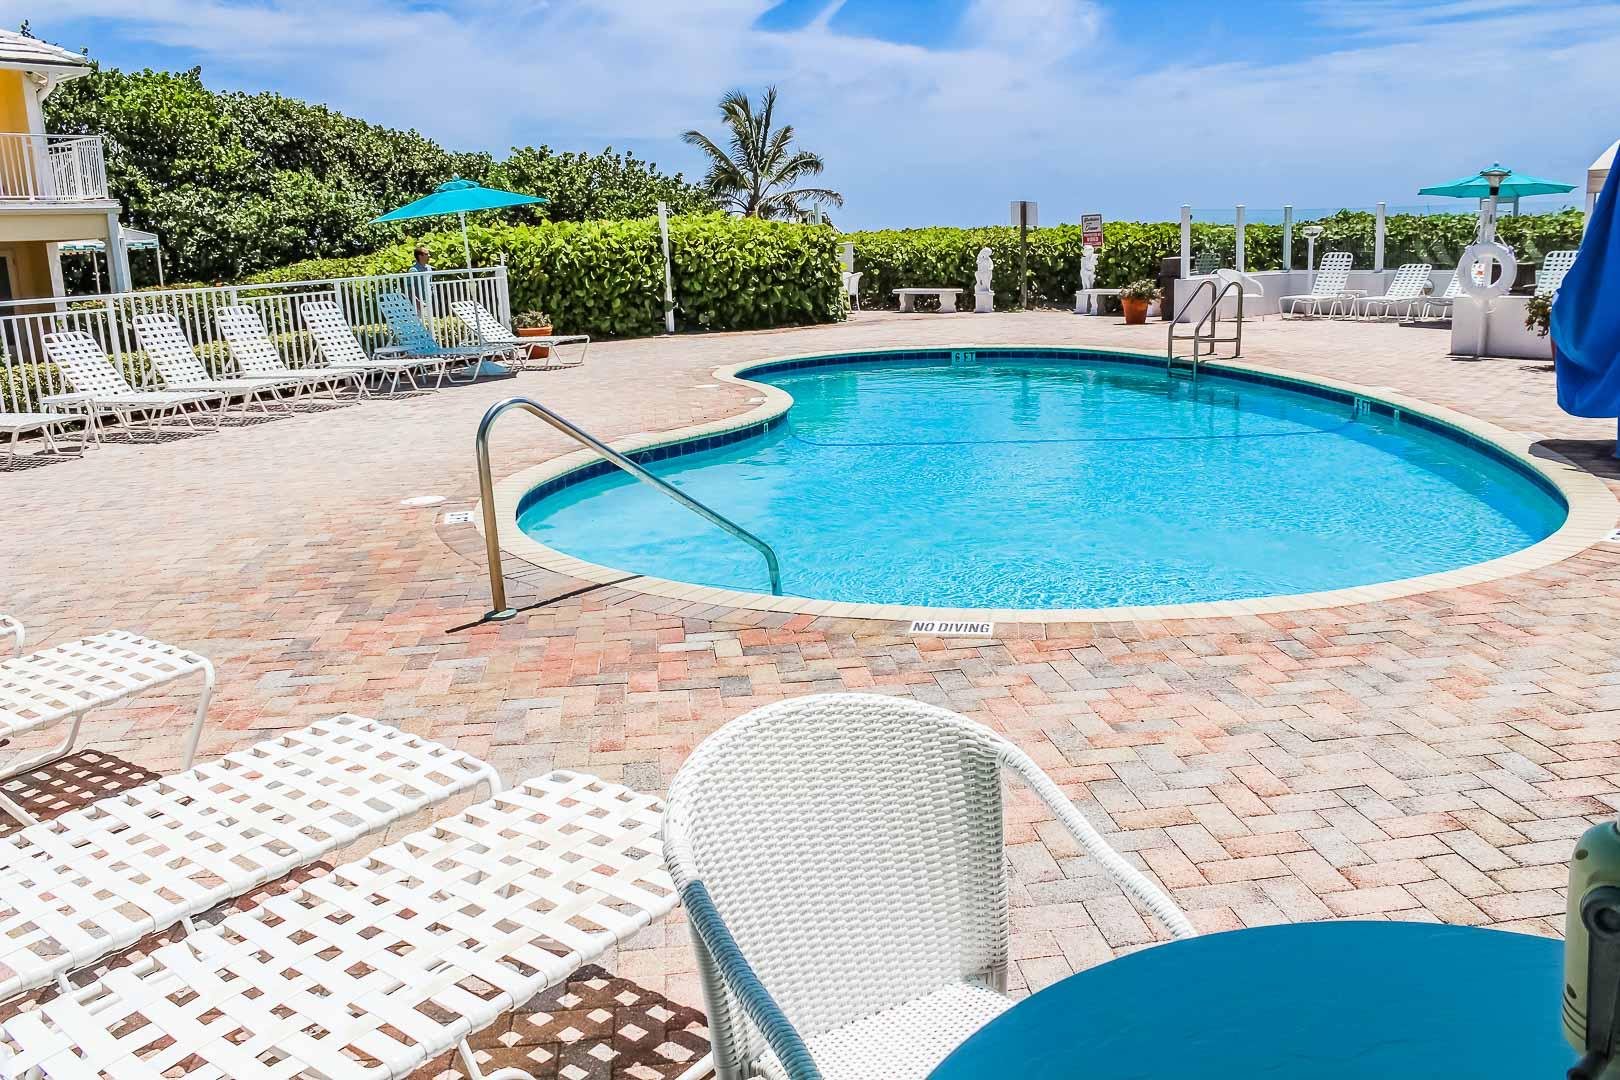 A crisp swimming pool at VRI's Berkshire by the Ocean in Florida.